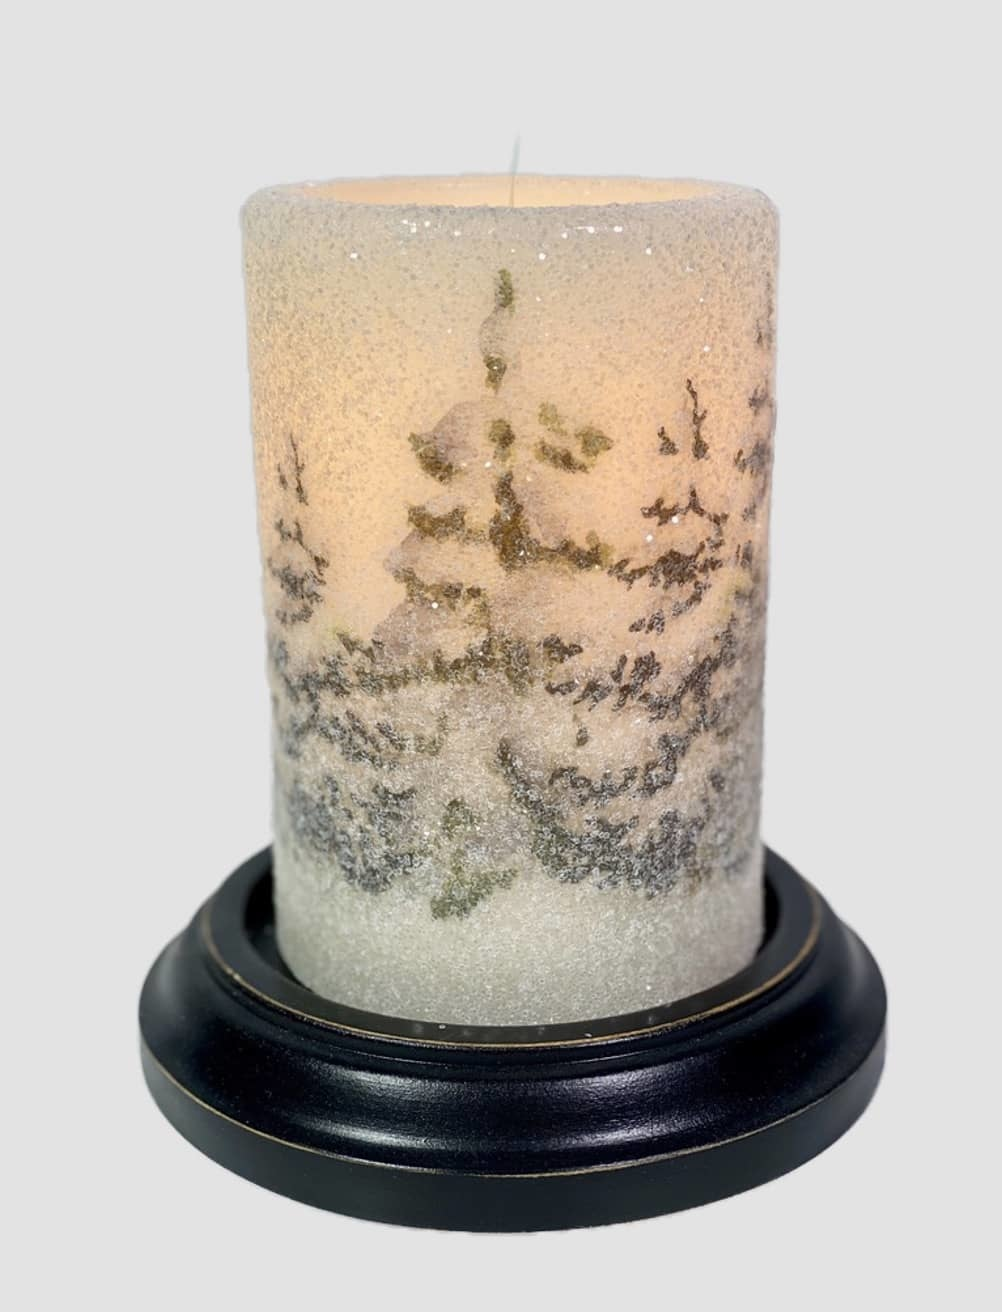 C R Designs Silent Snowfall Forest Candle Sleeve - Gumdrop